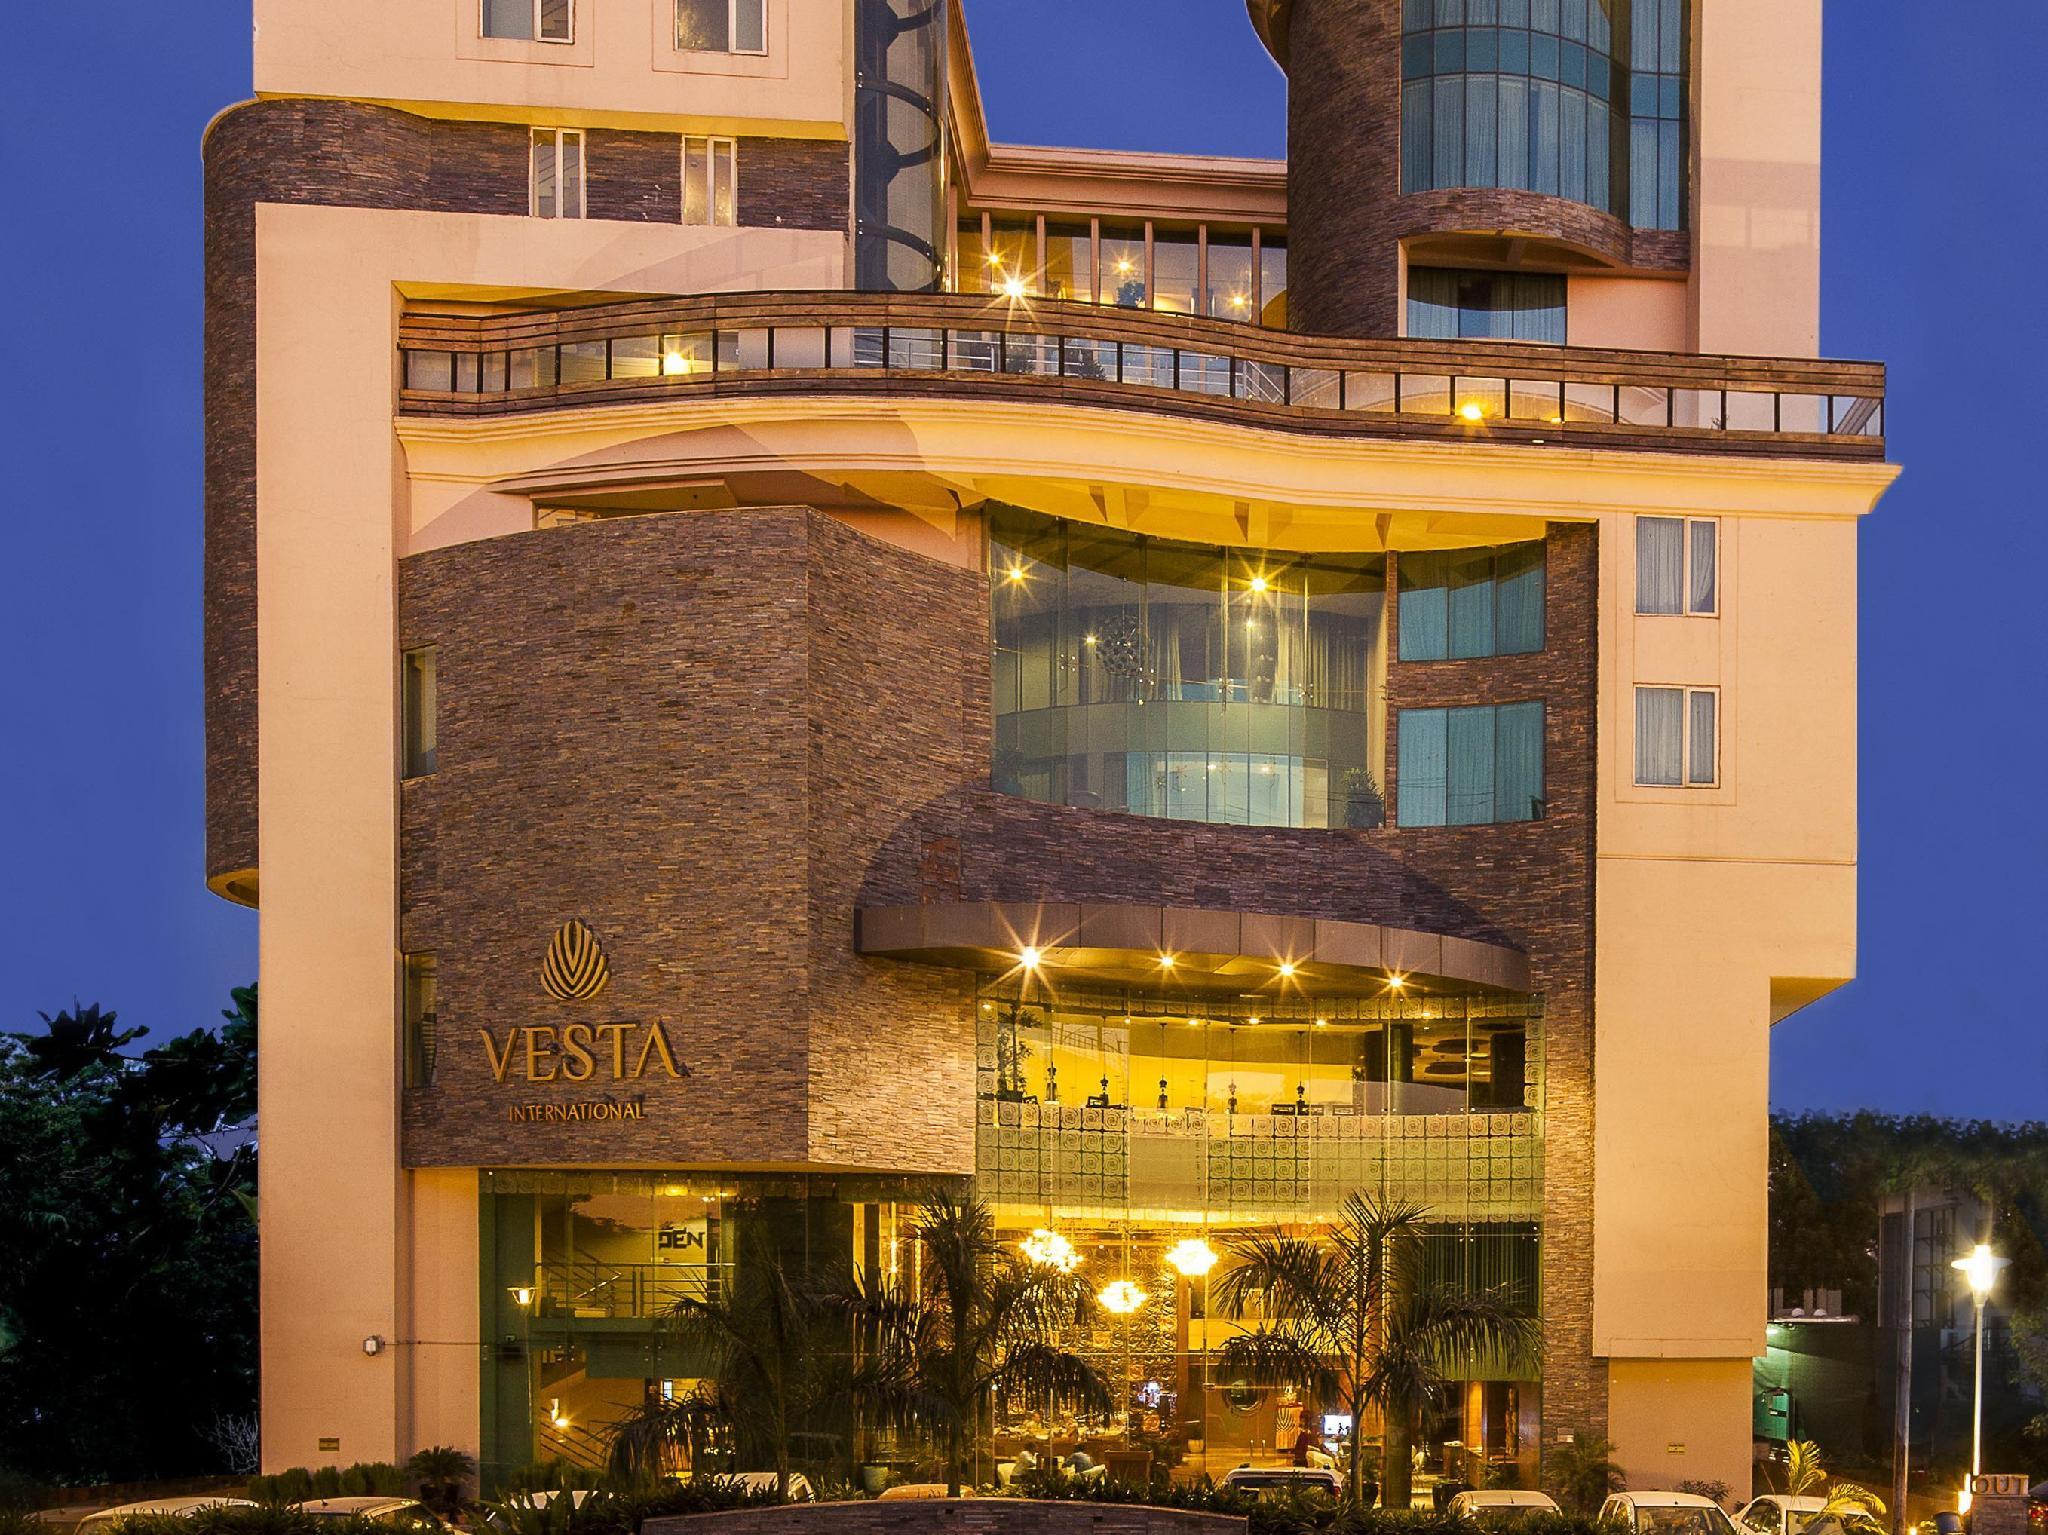 🟊🟊🟊🟊 Vesta International - Jaipur - India